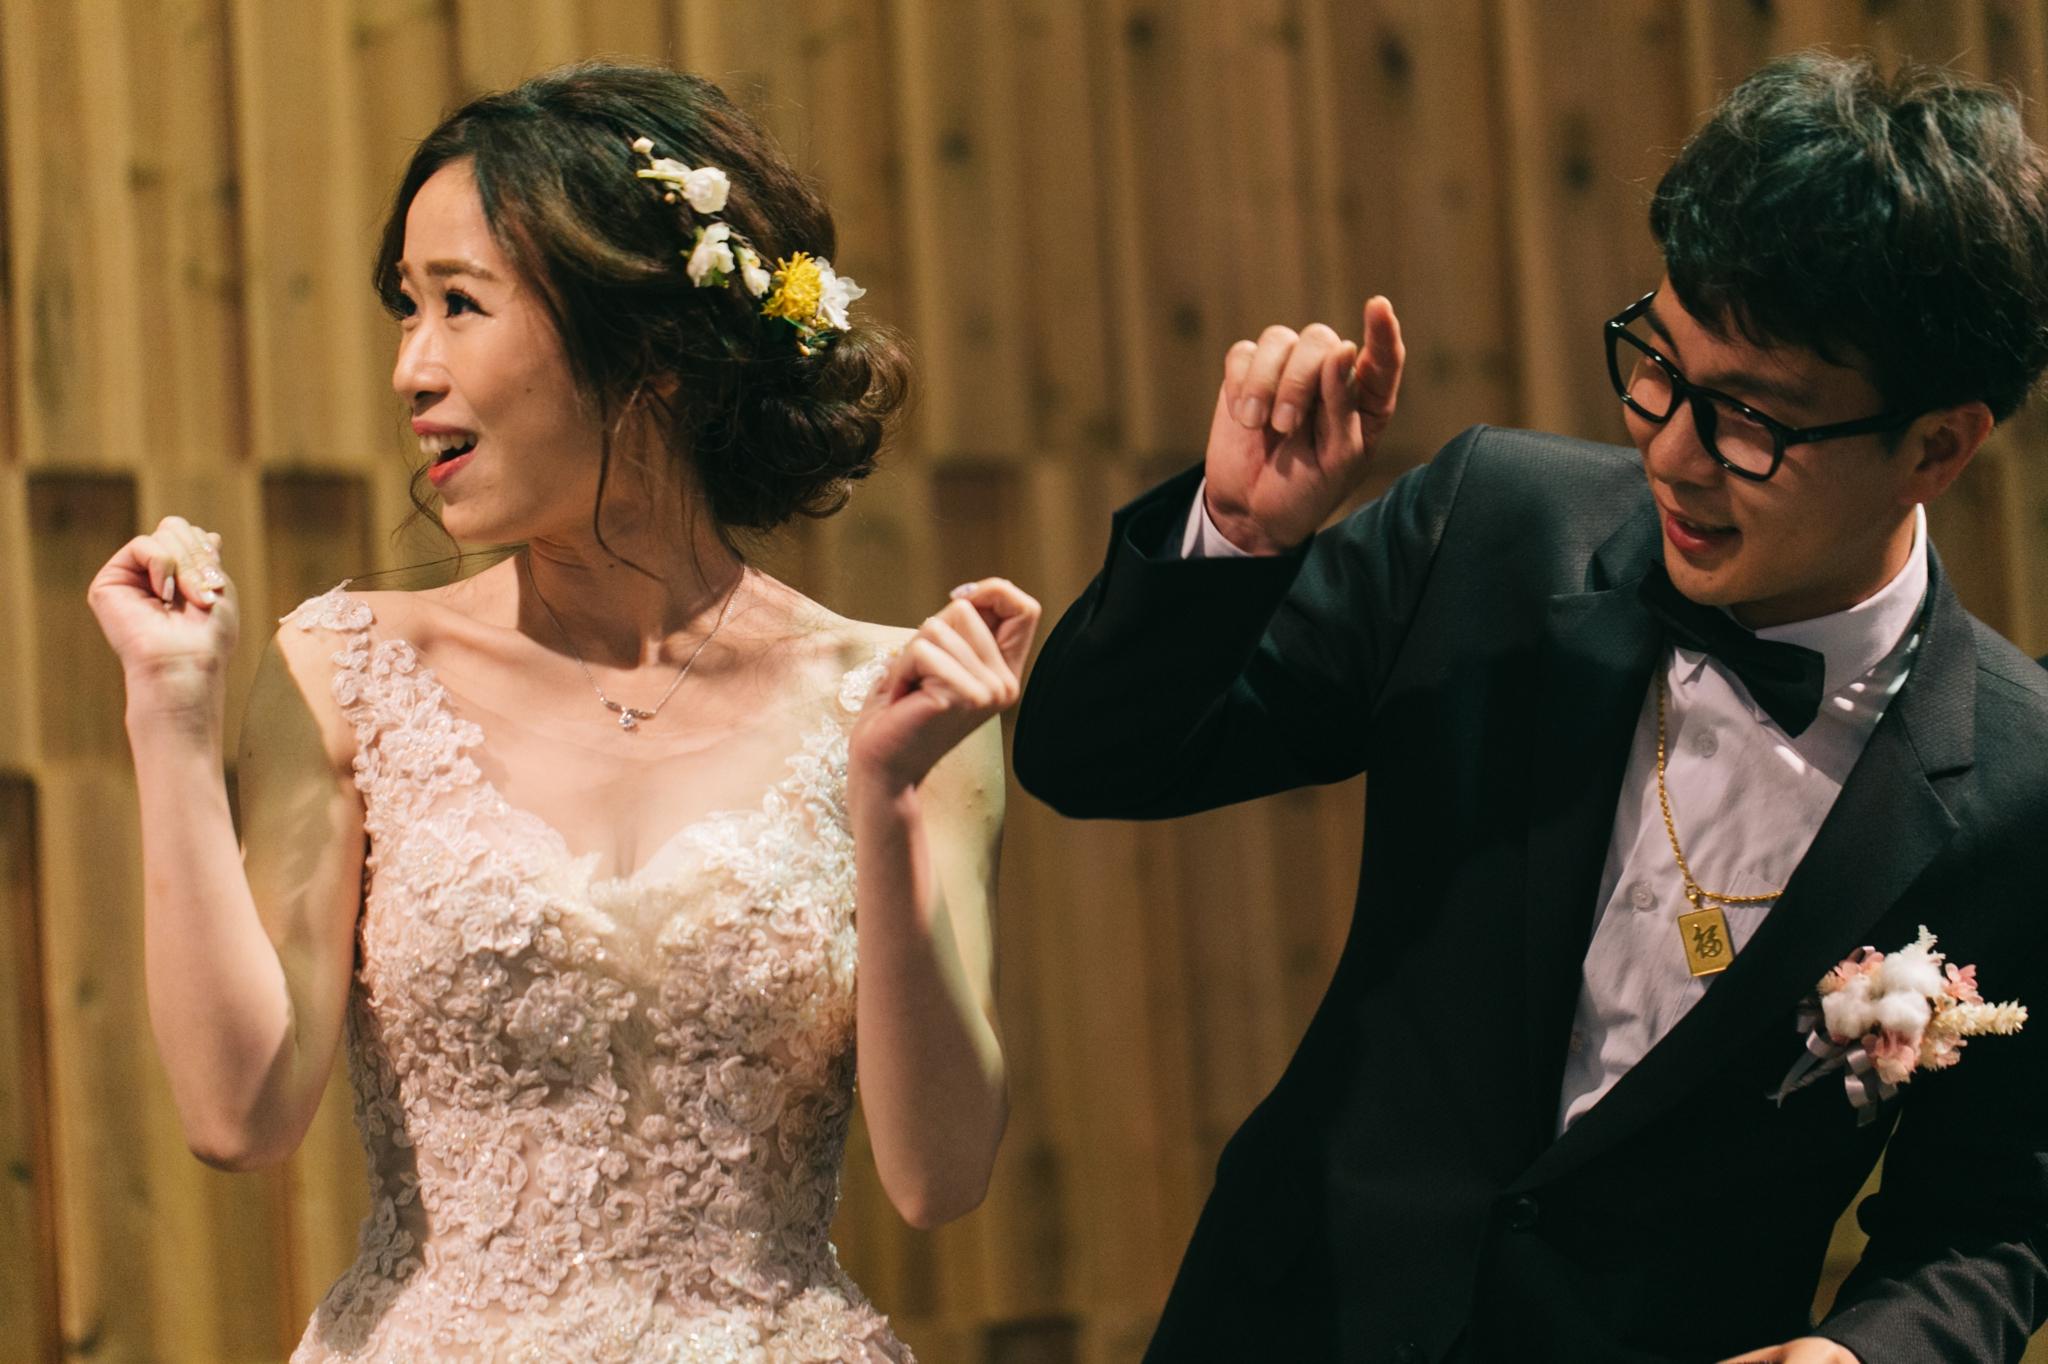 Tina+Nash-wedding-台北婚禮迎娶晚宴-新莊終身大事-139.jpg